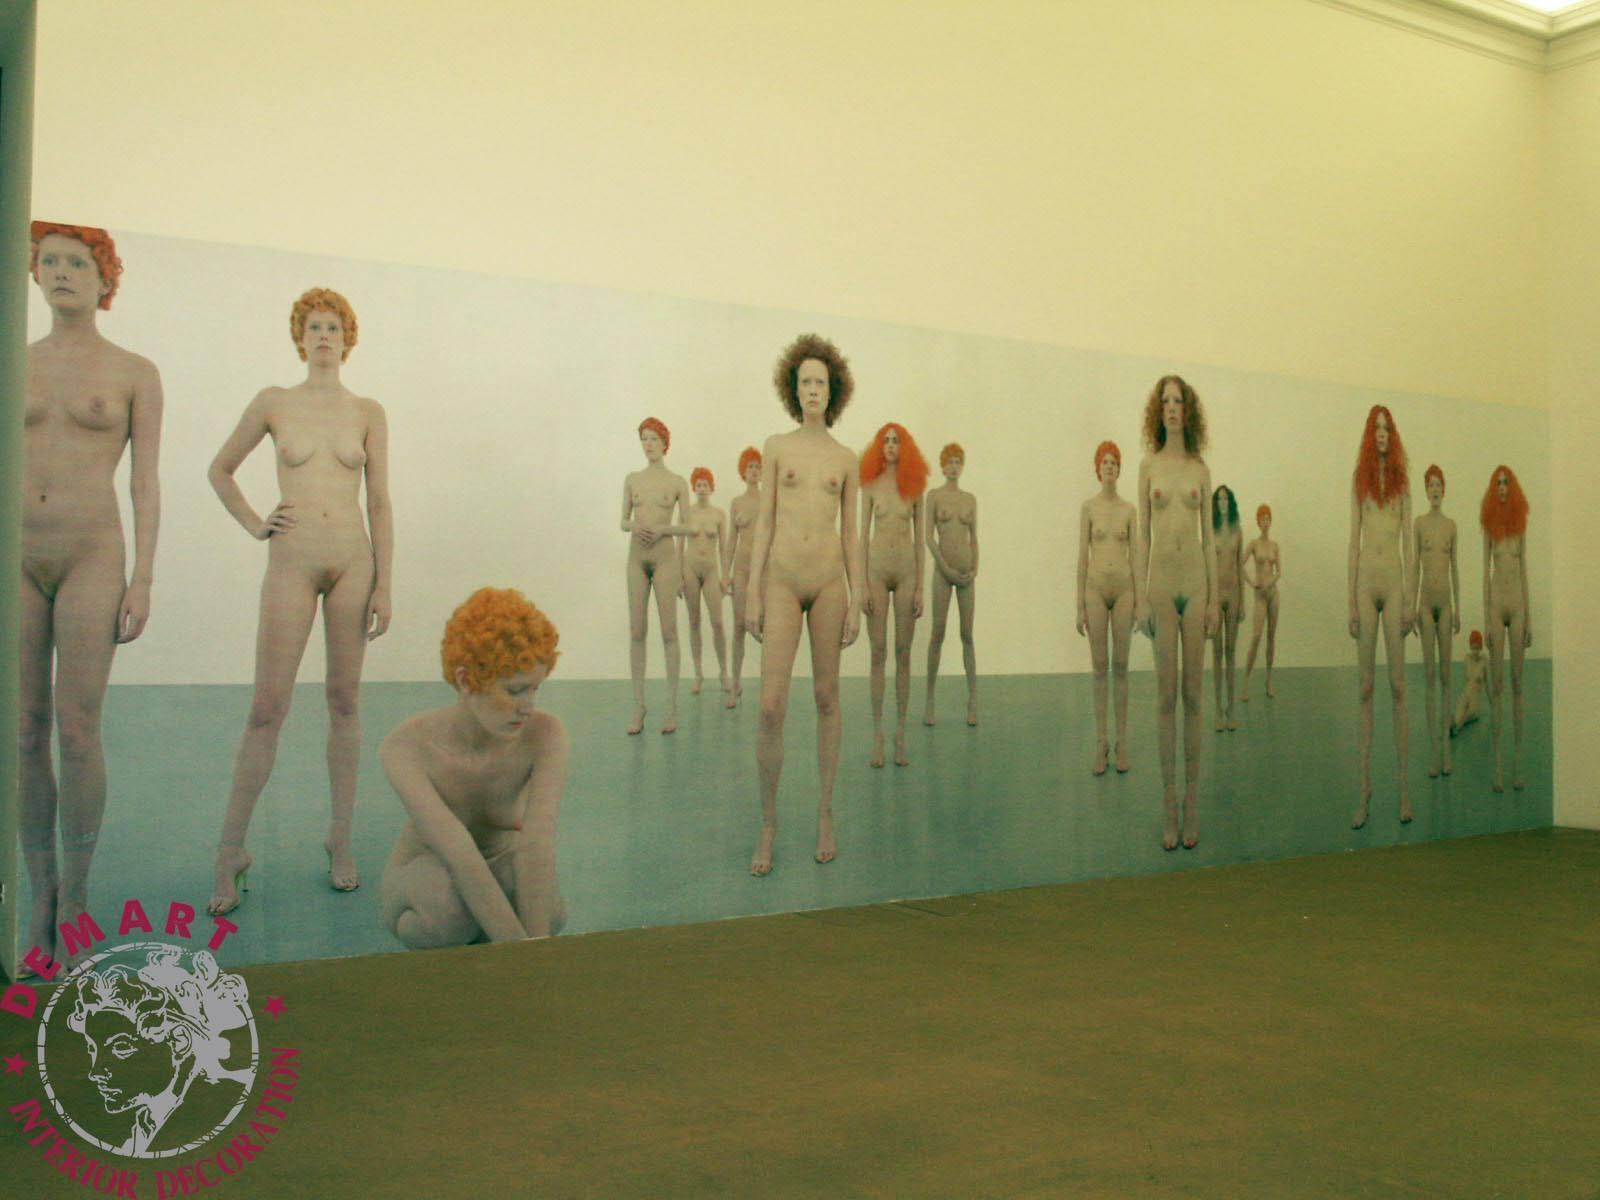 museo-arte-rivoli-vanessa-beecroft-affresco-digitale-04